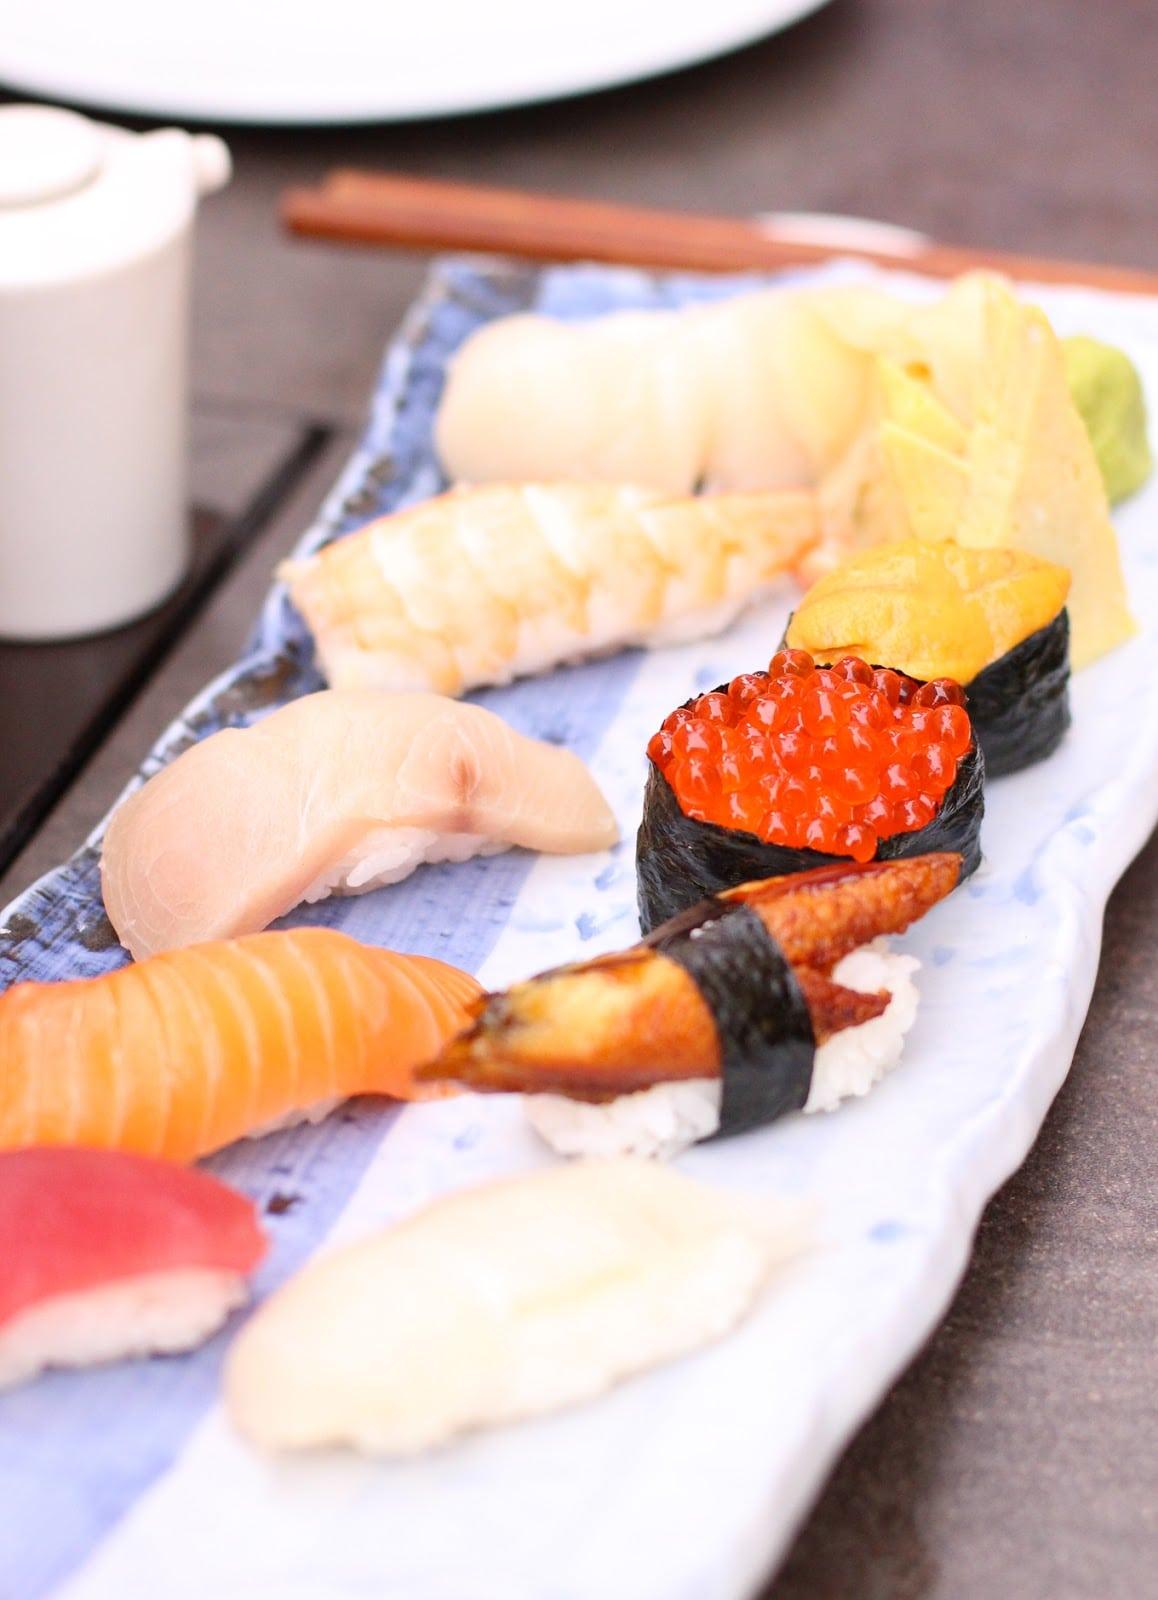 nomi-garden-sushi-menu-2.jpg